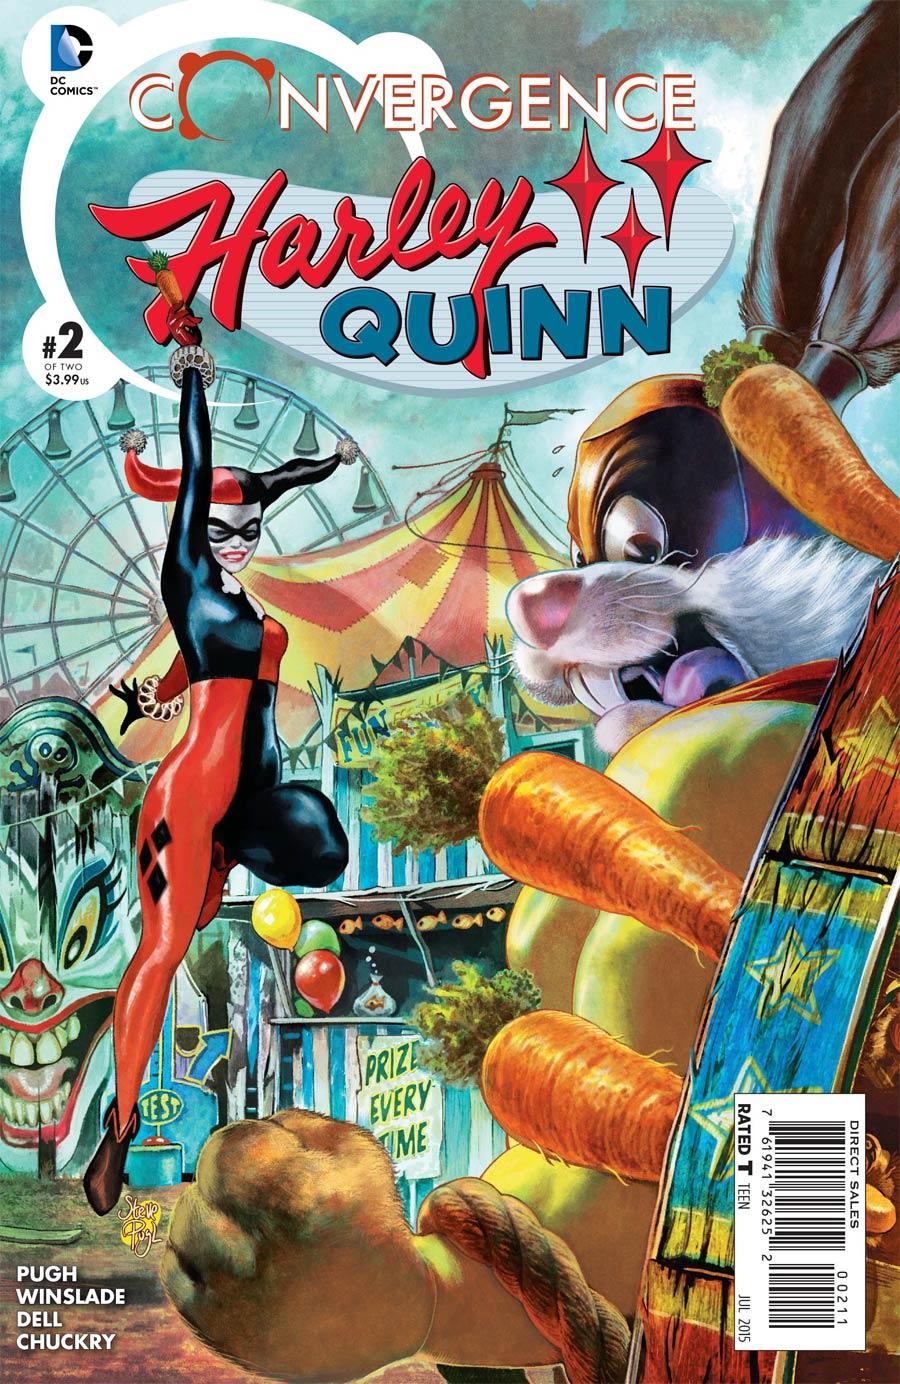 Convergence Harley Quinn #2 Cover A Regular Steve Pugh Cover